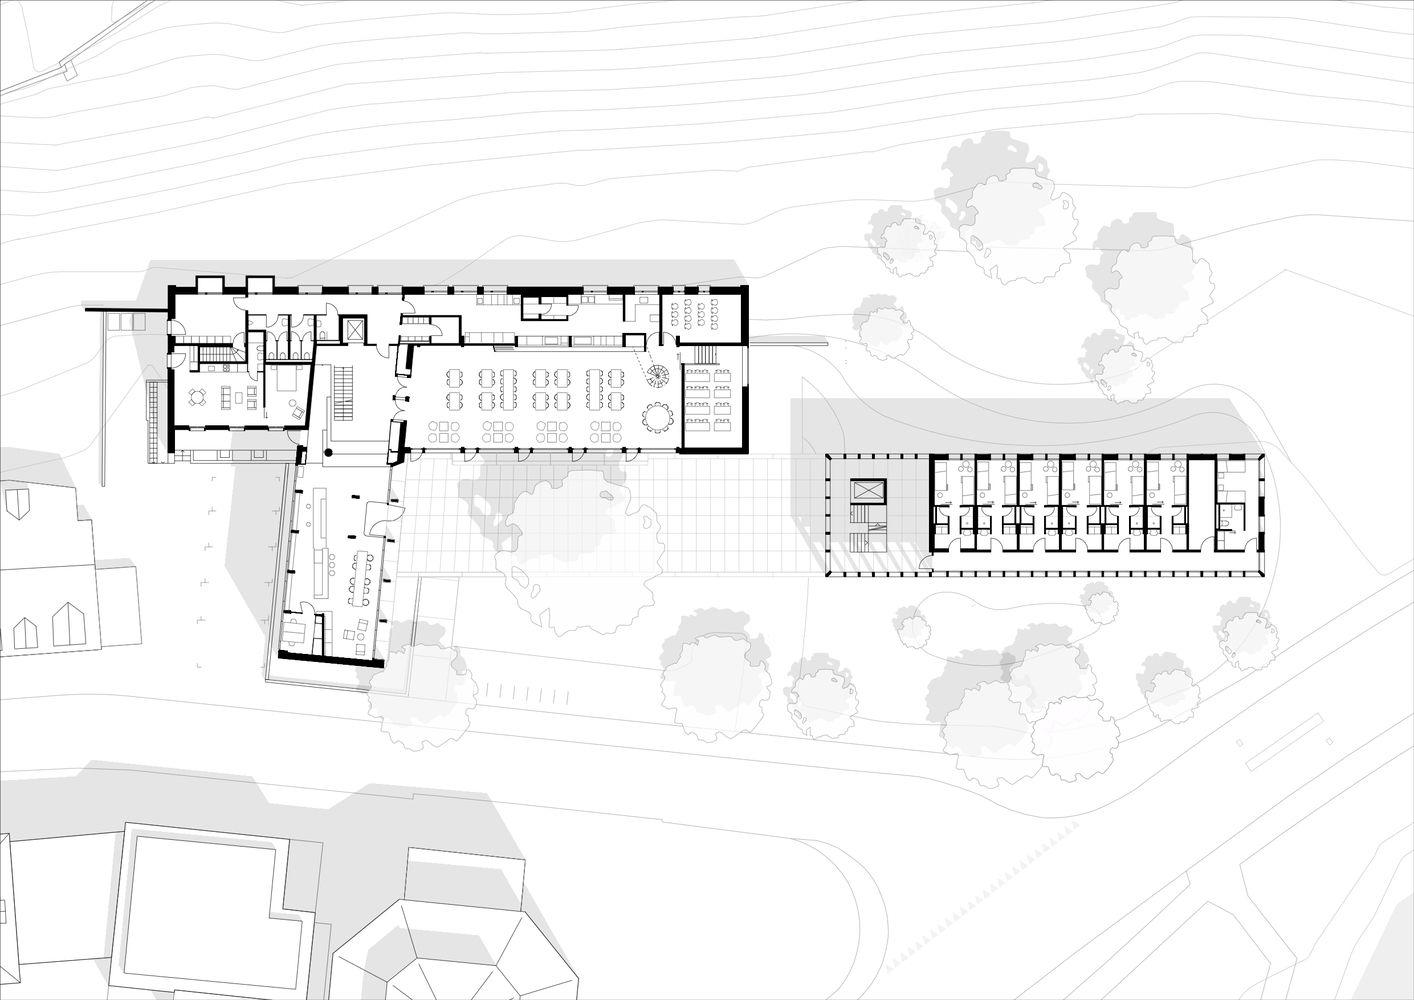 Gallery Of Youth Hostel Bern Aebi Vincent Architects 19 Youth Hostel Hostel Architect